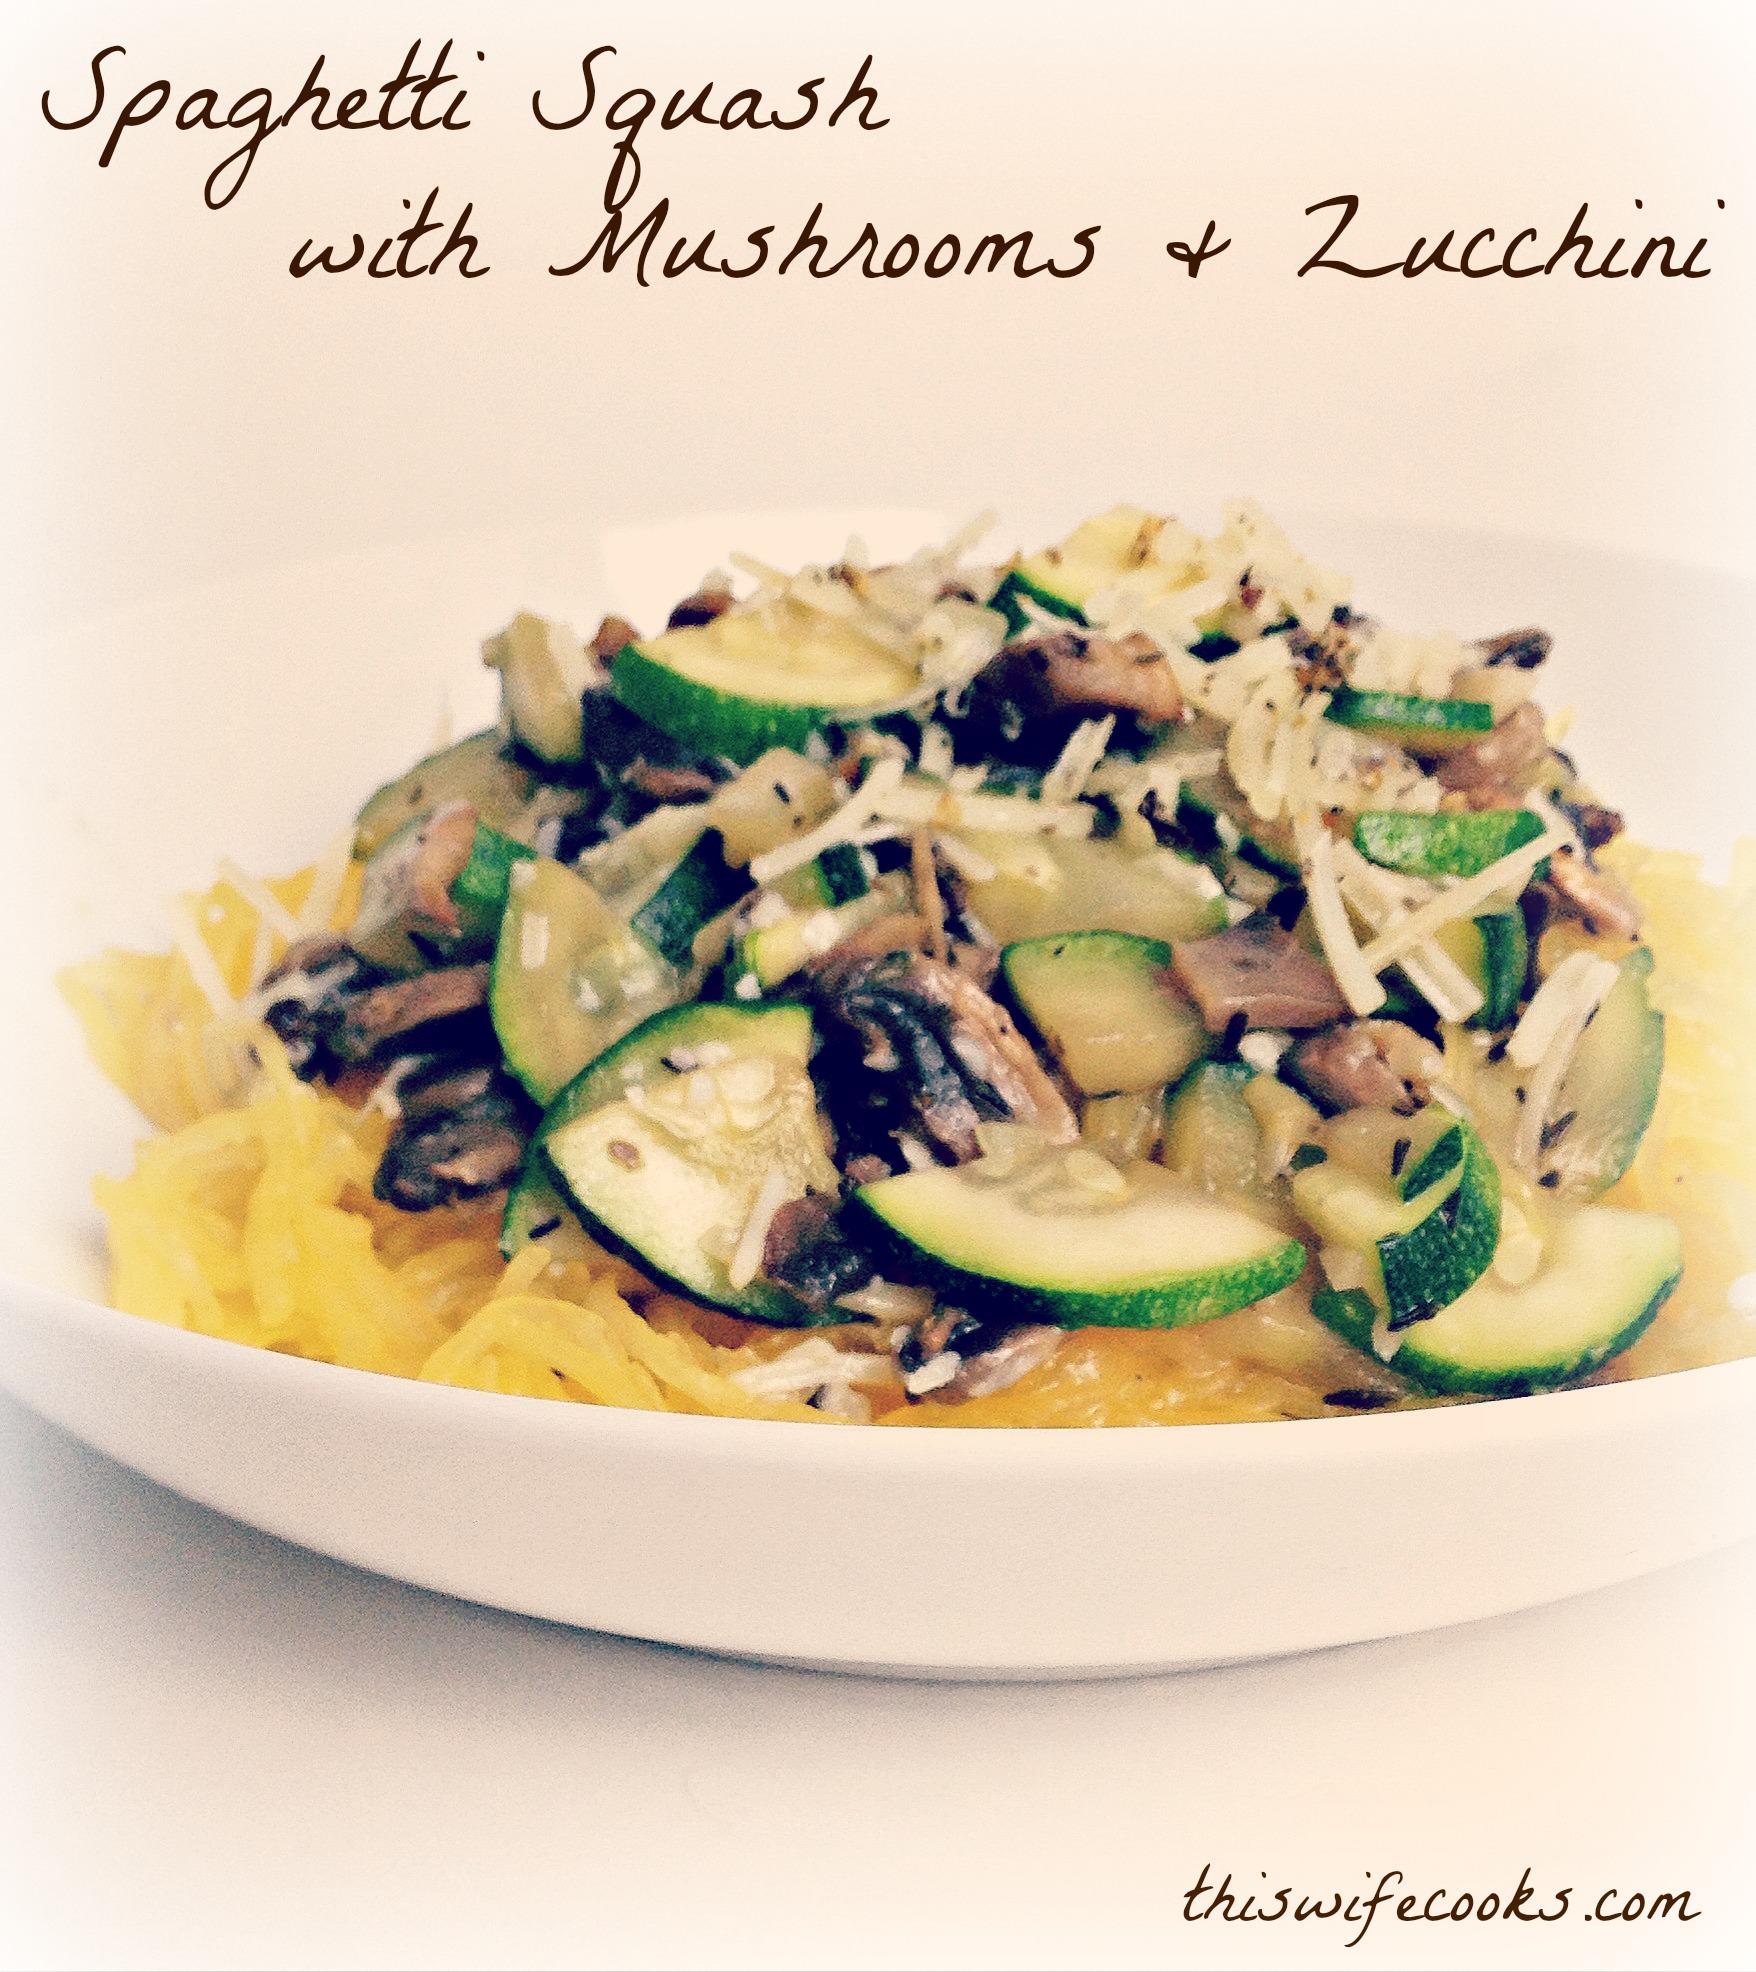 Spaghetti Squash with Mushrooms & Zucchini via @thiswifecooks